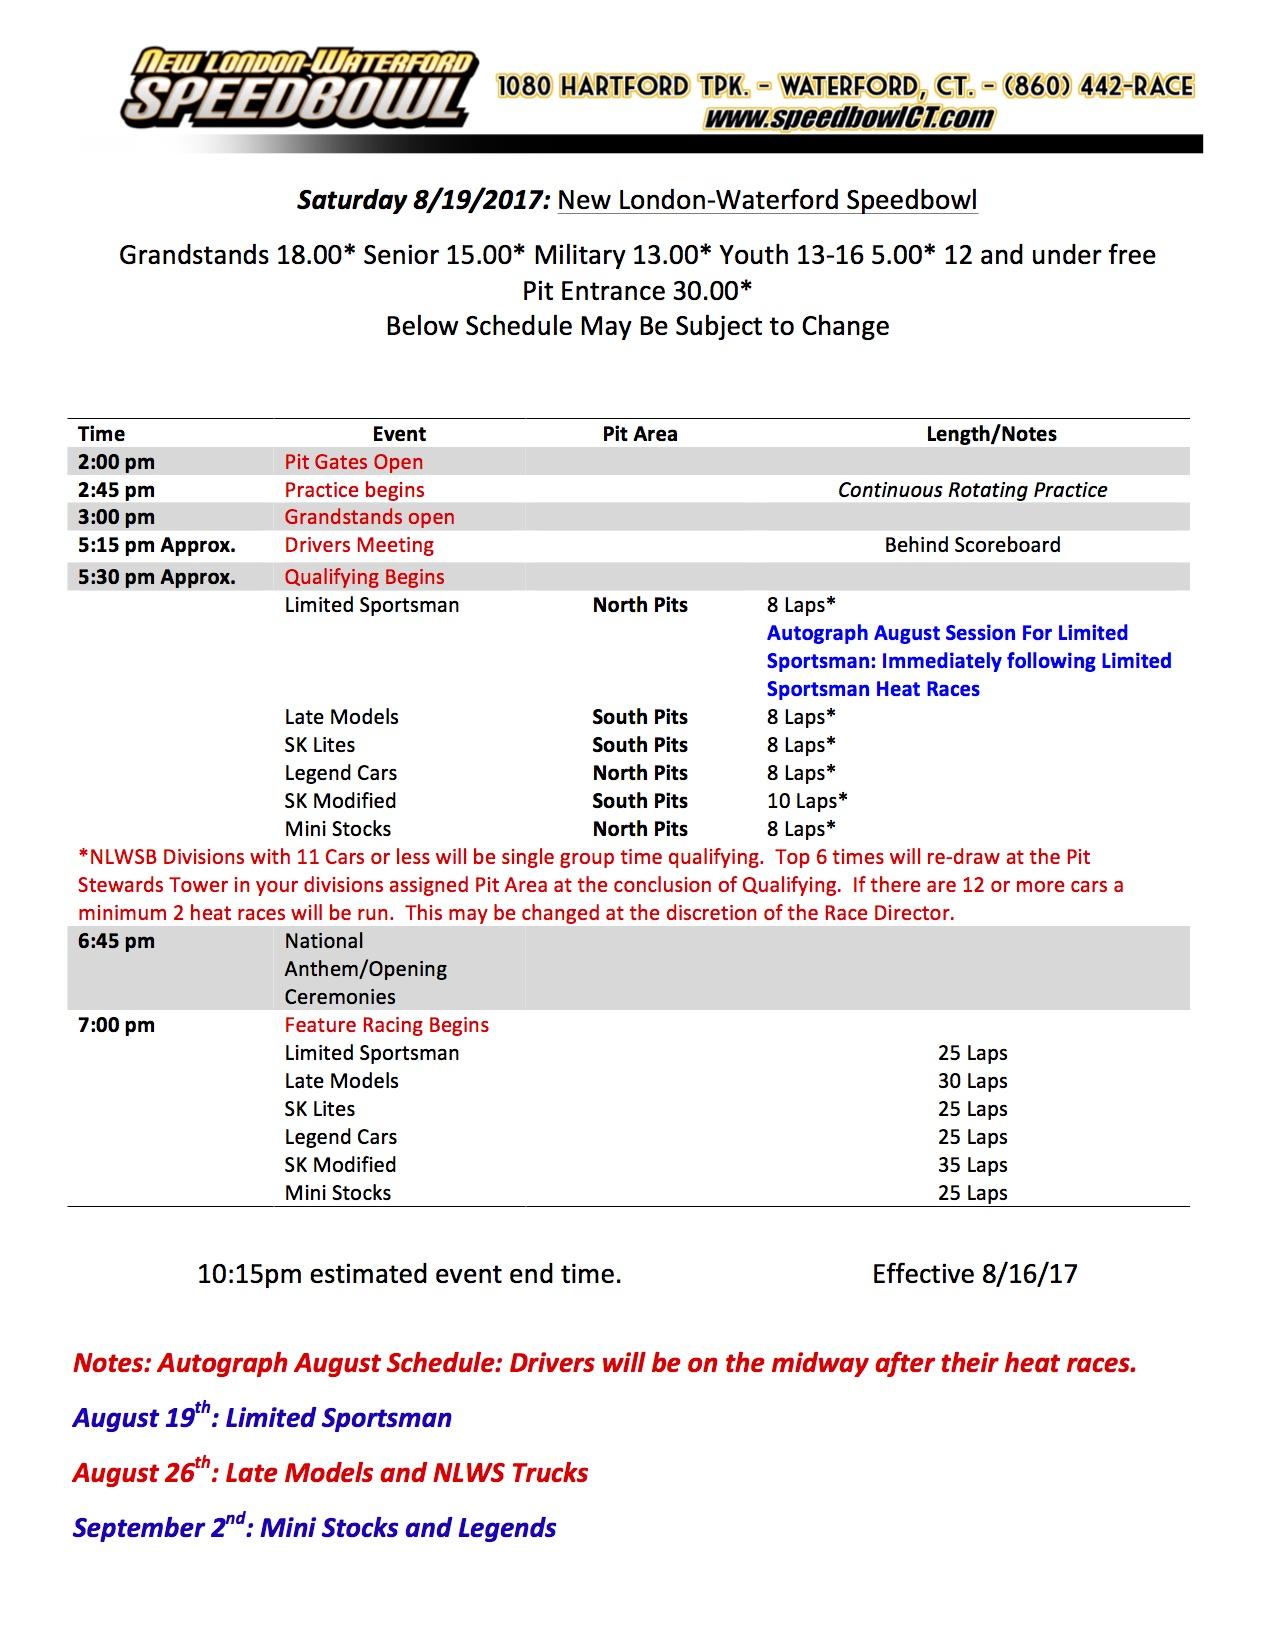 Saturday Race Day Schedule